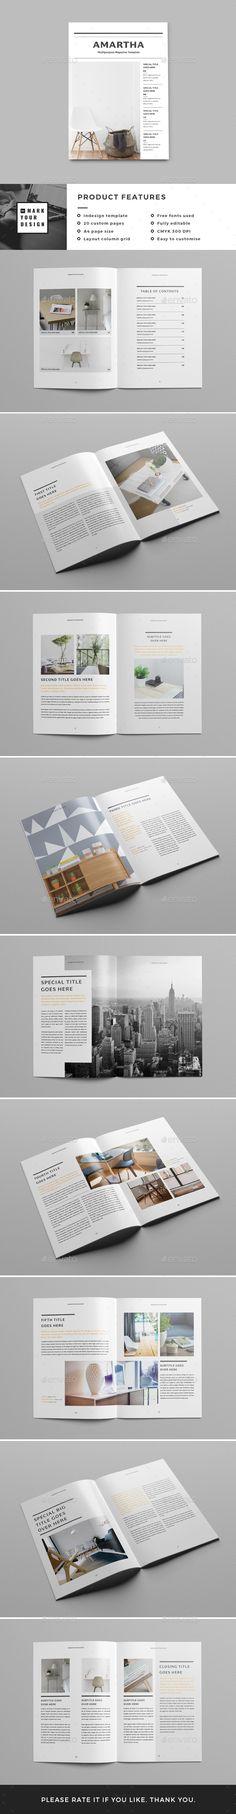 Clean Magazine Template | Print templates, Indesign magazine ...